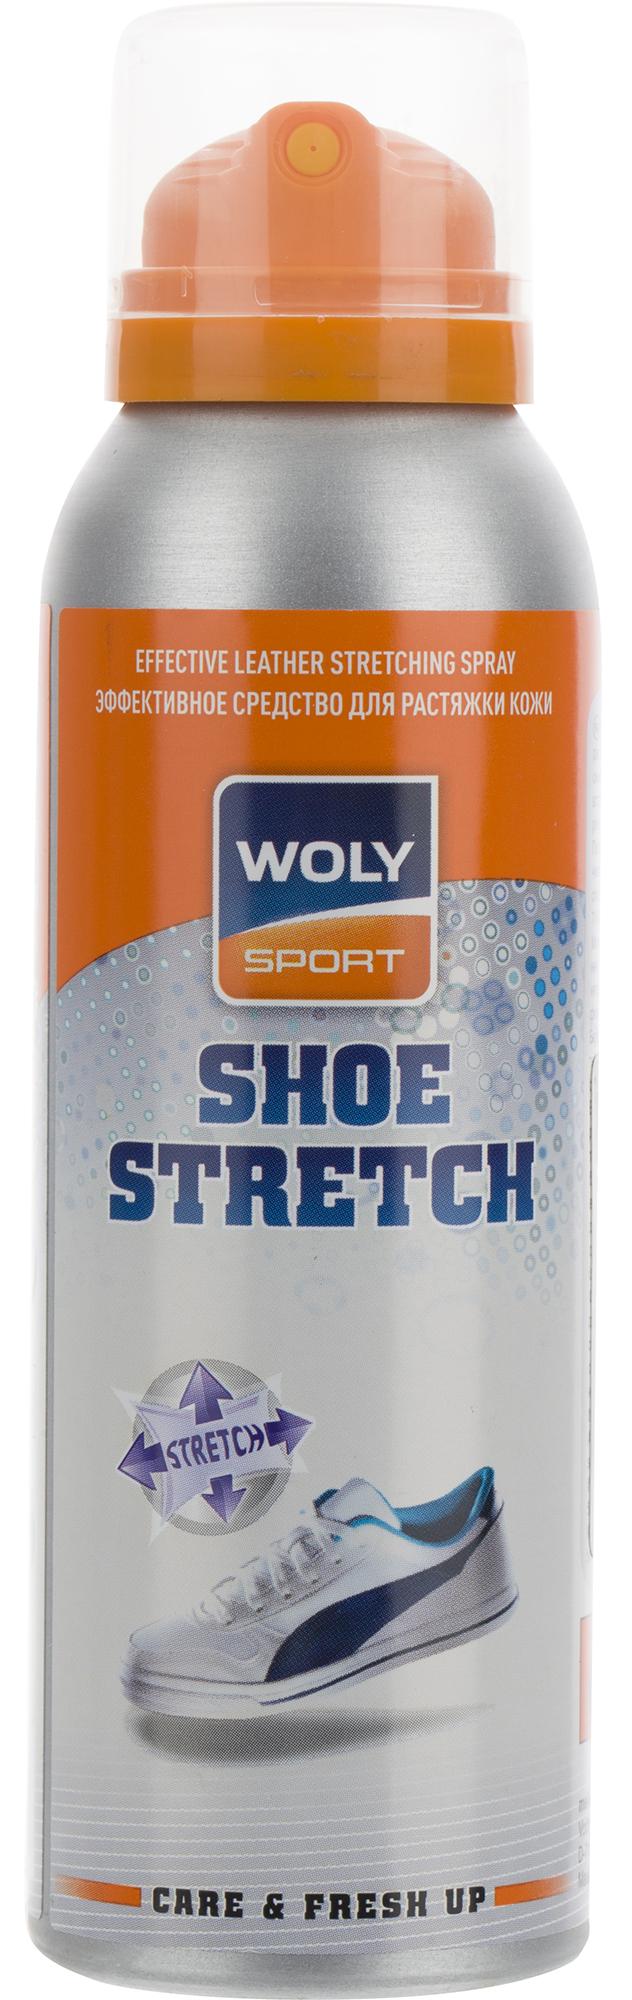 Woly Растяжитель Woly Sport, 125 мл цена и фото